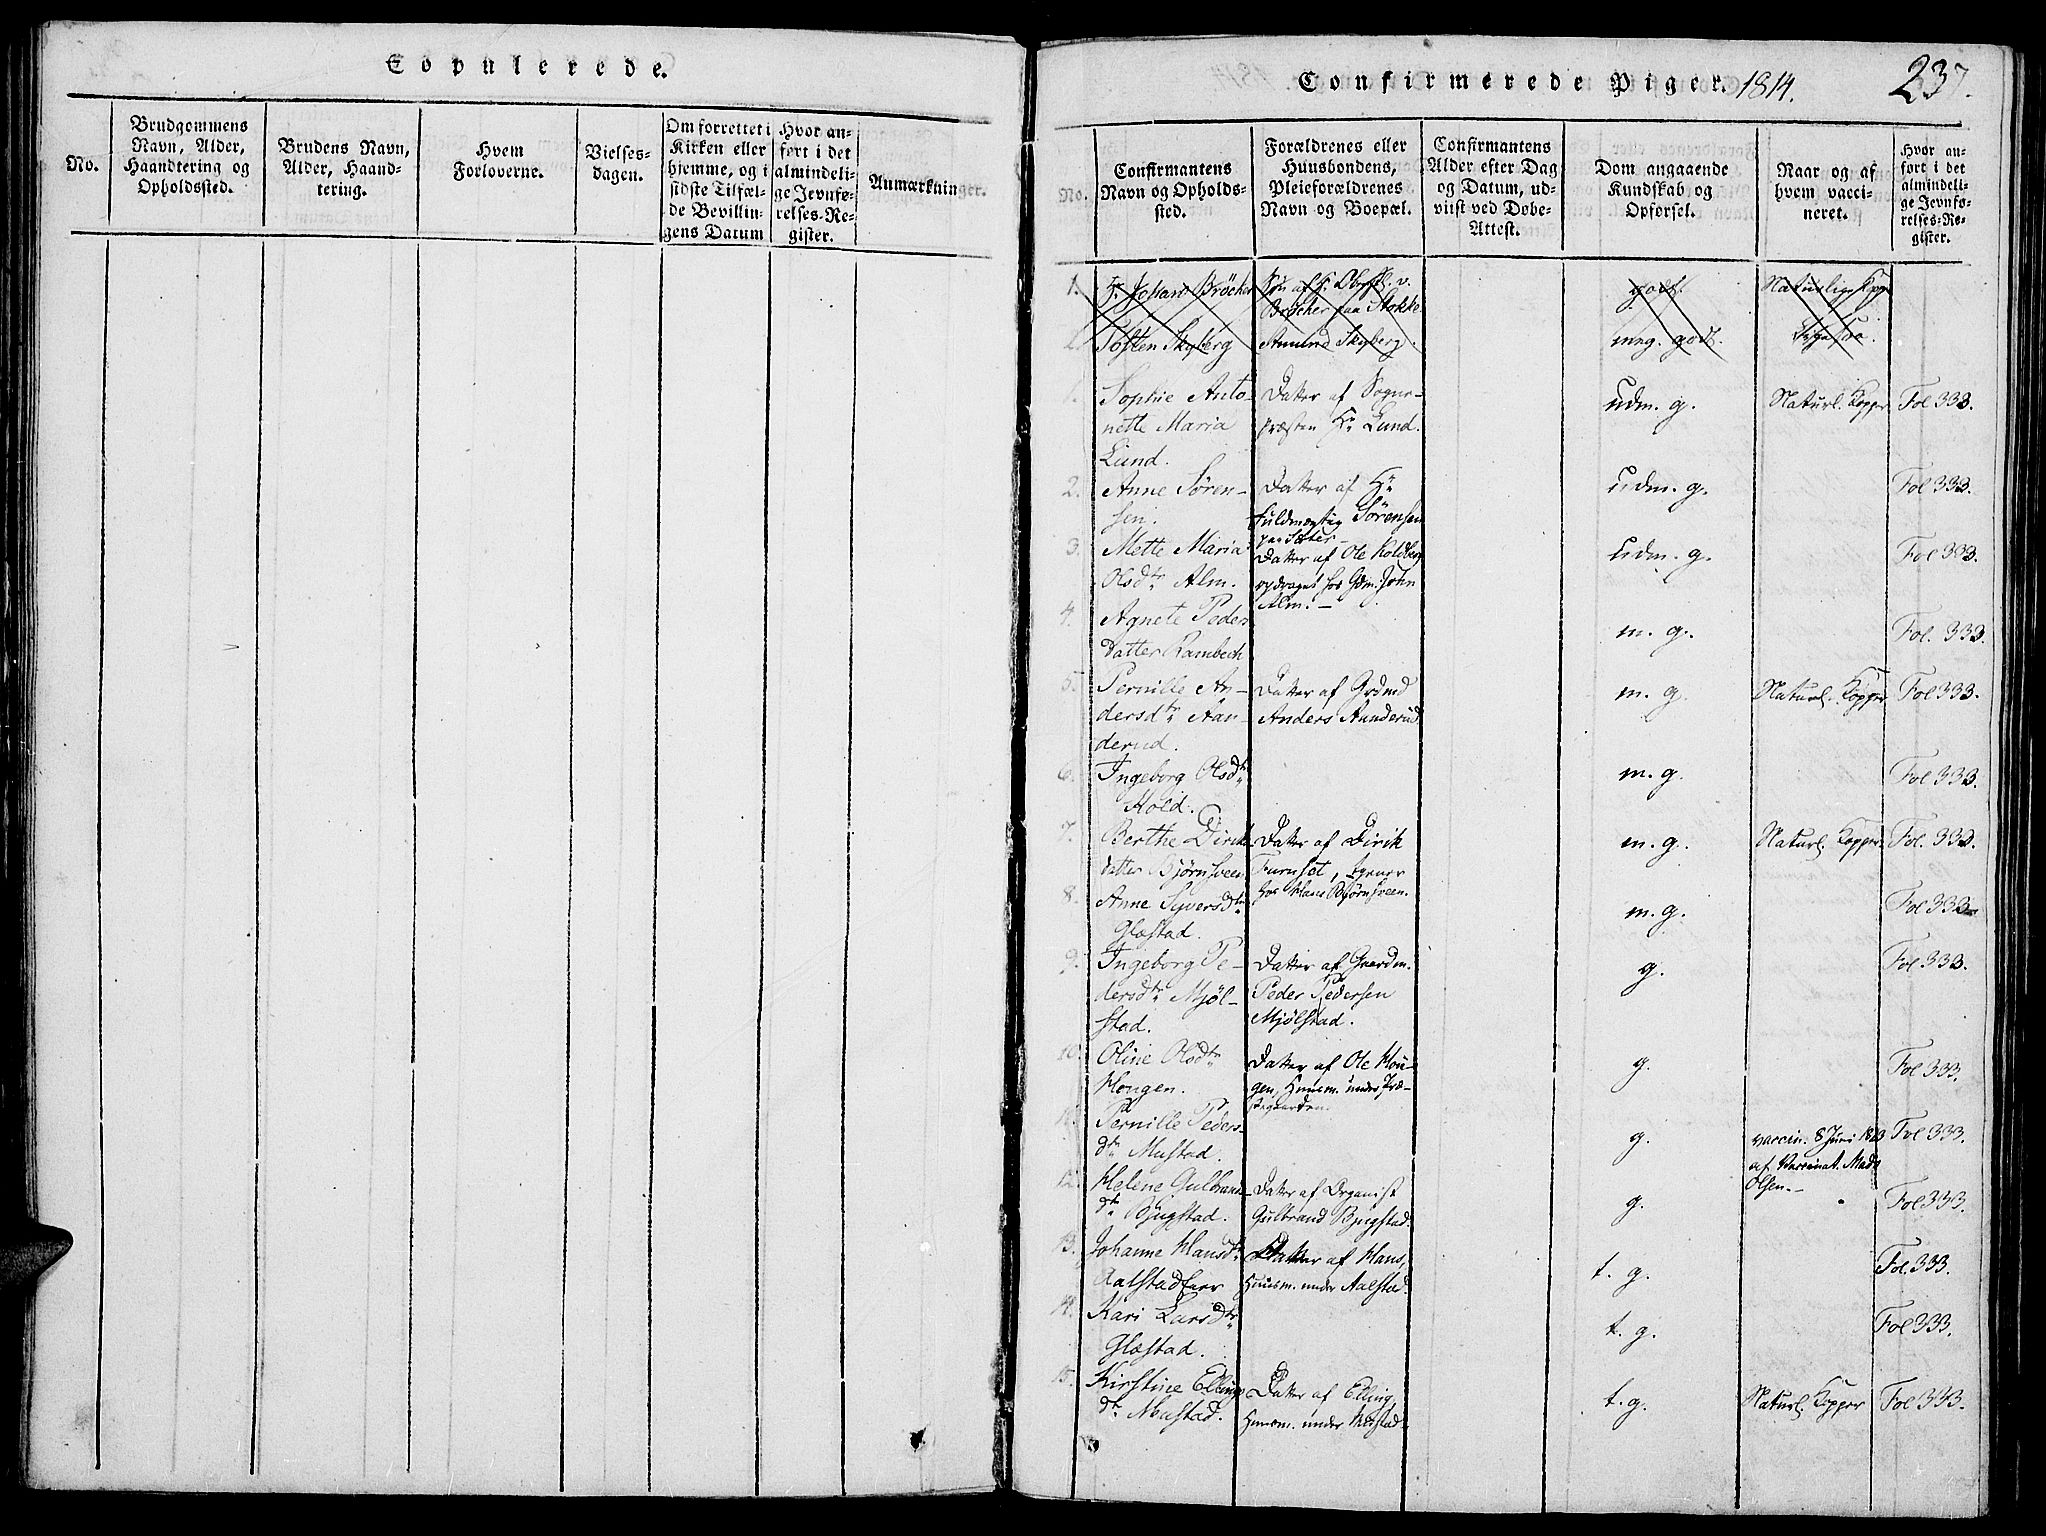 SAH, Vardal prestekontor, H/Ha/Haa/L0004: Ministerialbok nr. 4, 1814-1831, s. 237